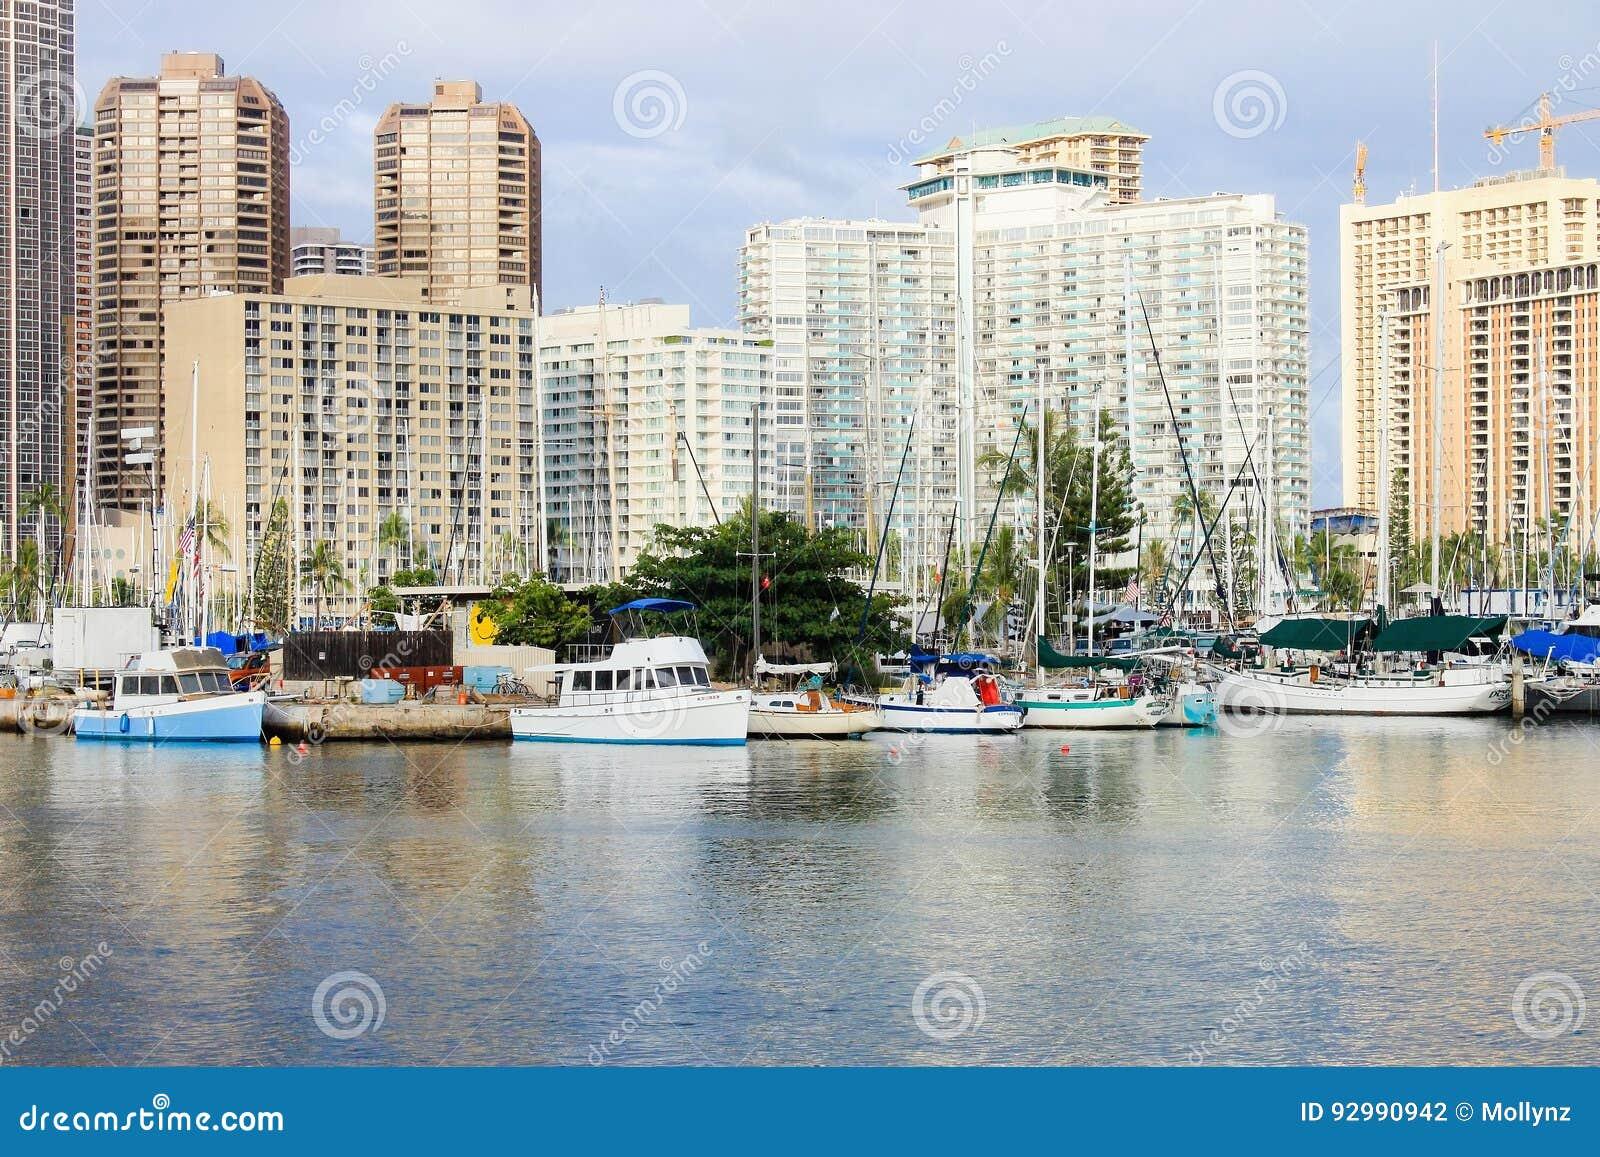 Honolulu, Hawaii, USA - May 30, 2016: Yachts docked at Ala Wai Boat Harbor